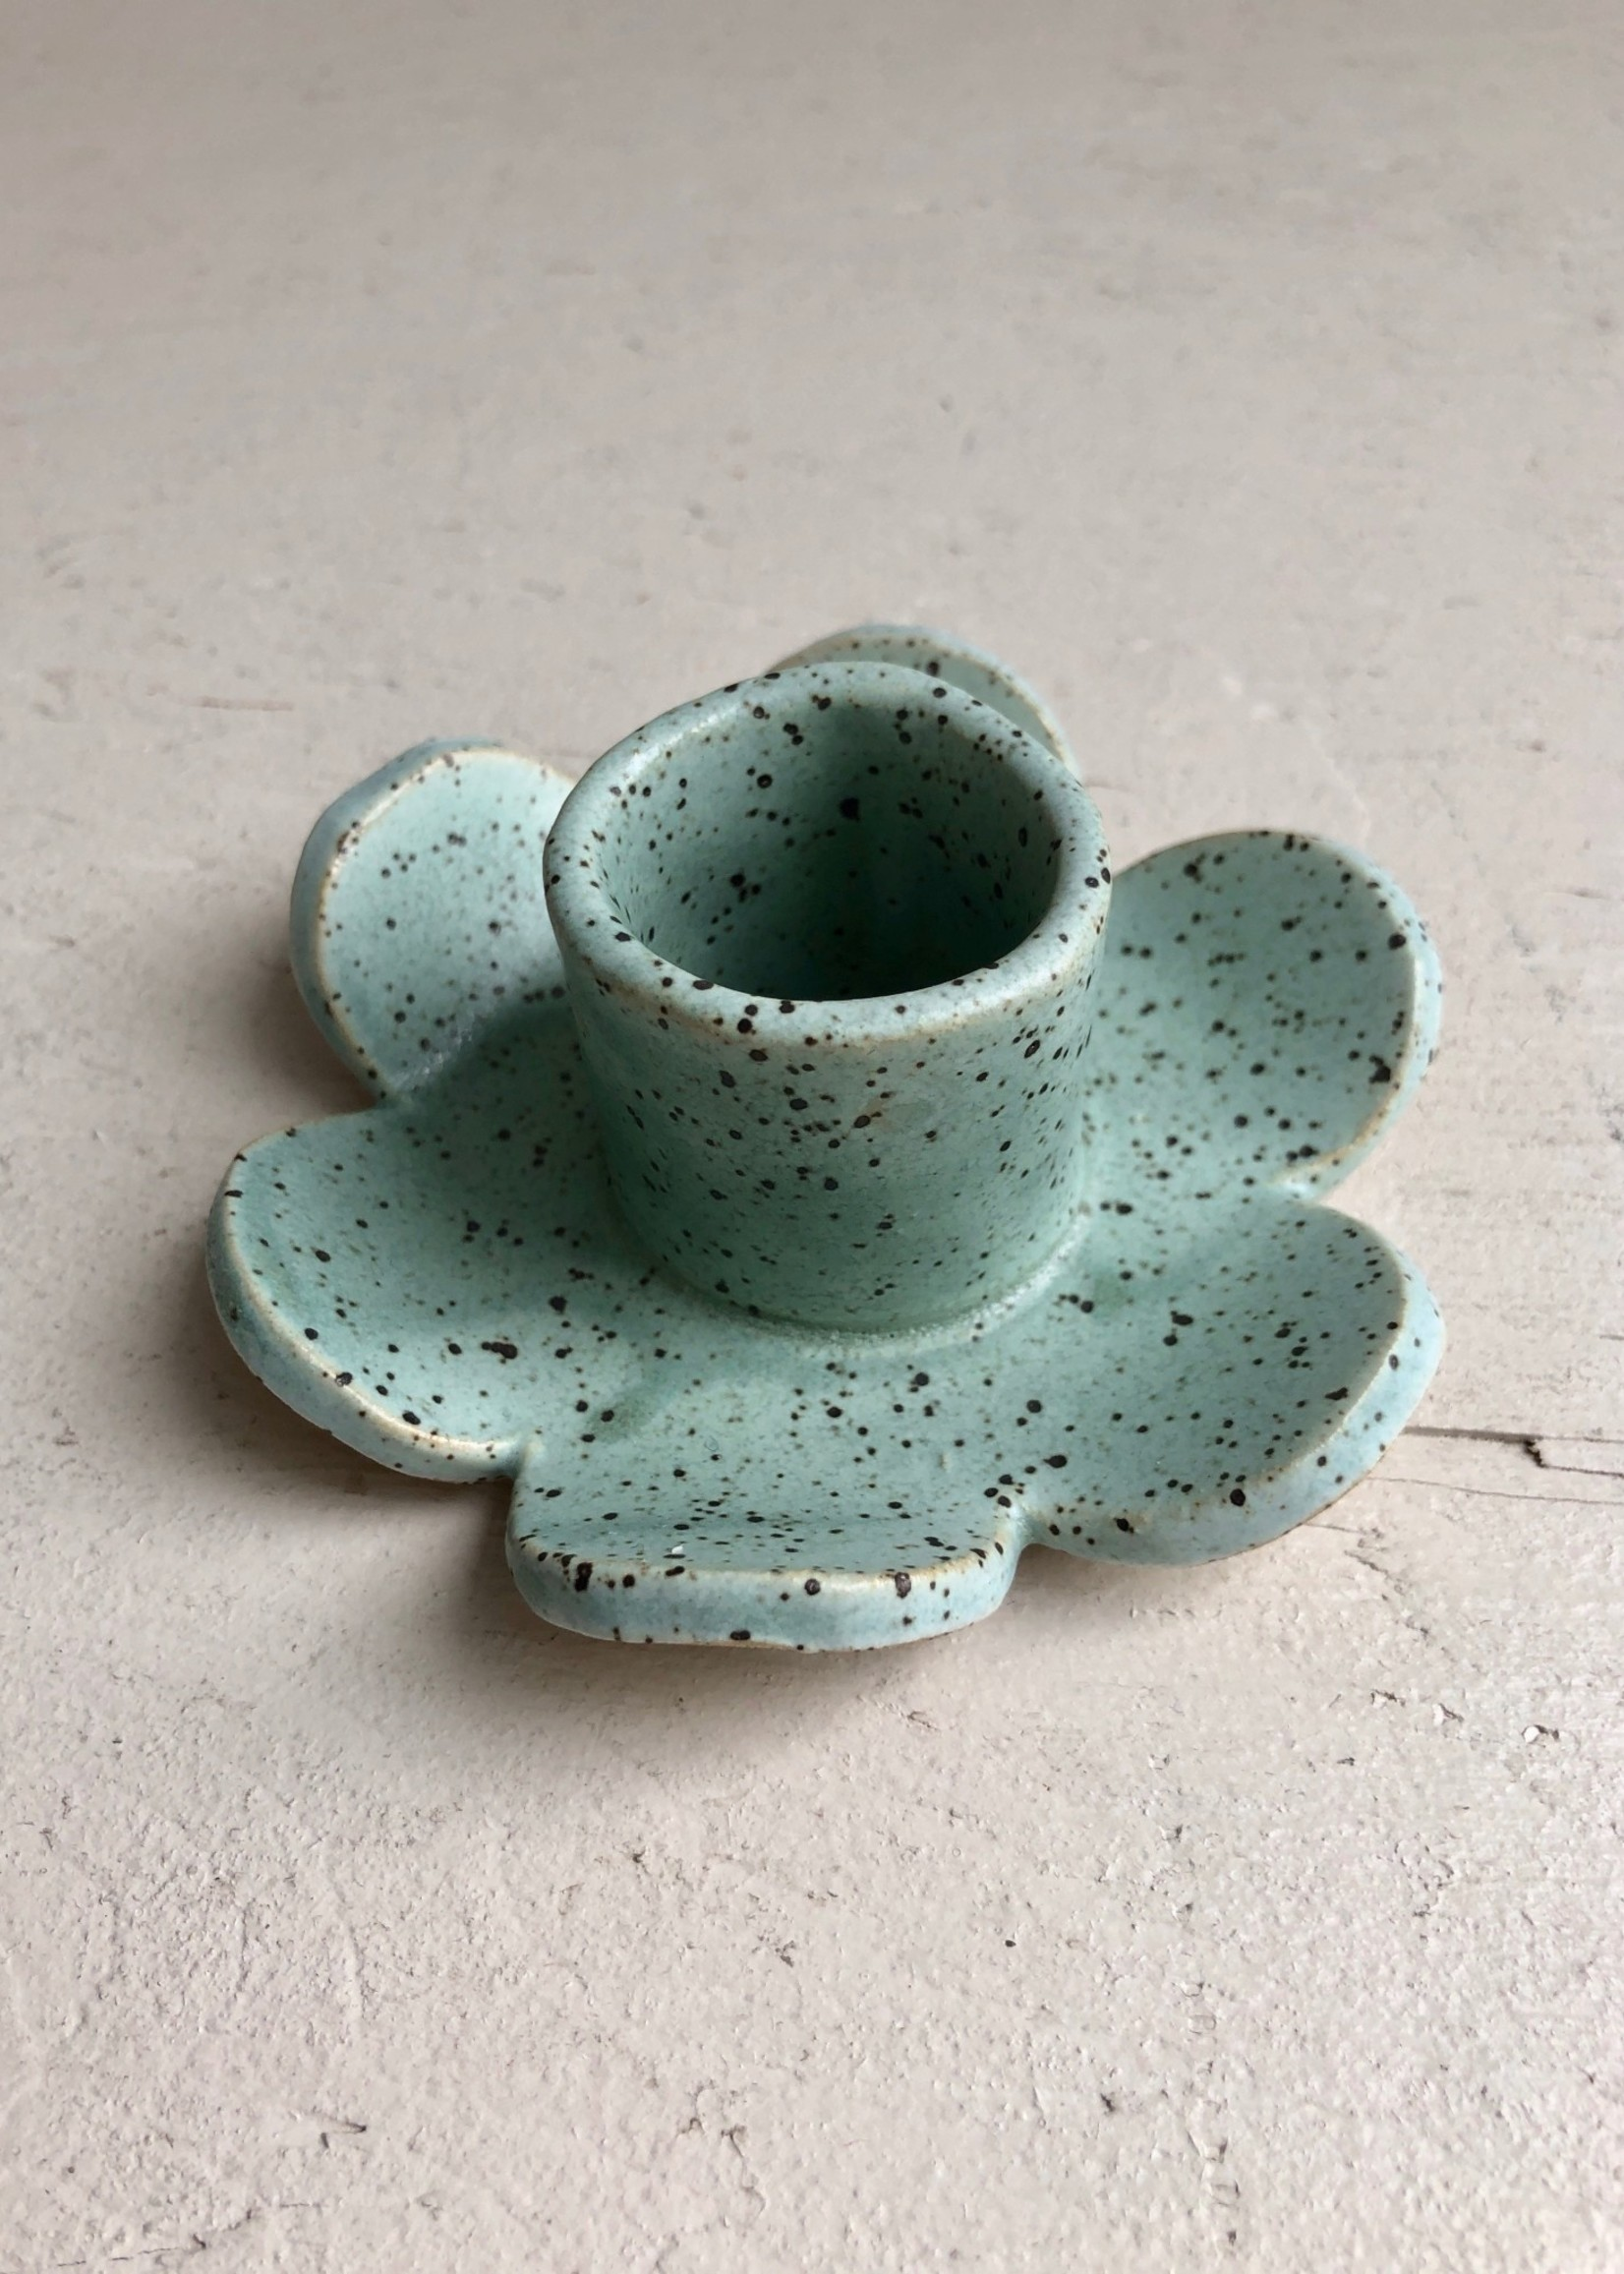 Minipott Ceramic Daisy Candle Holders by Minipott